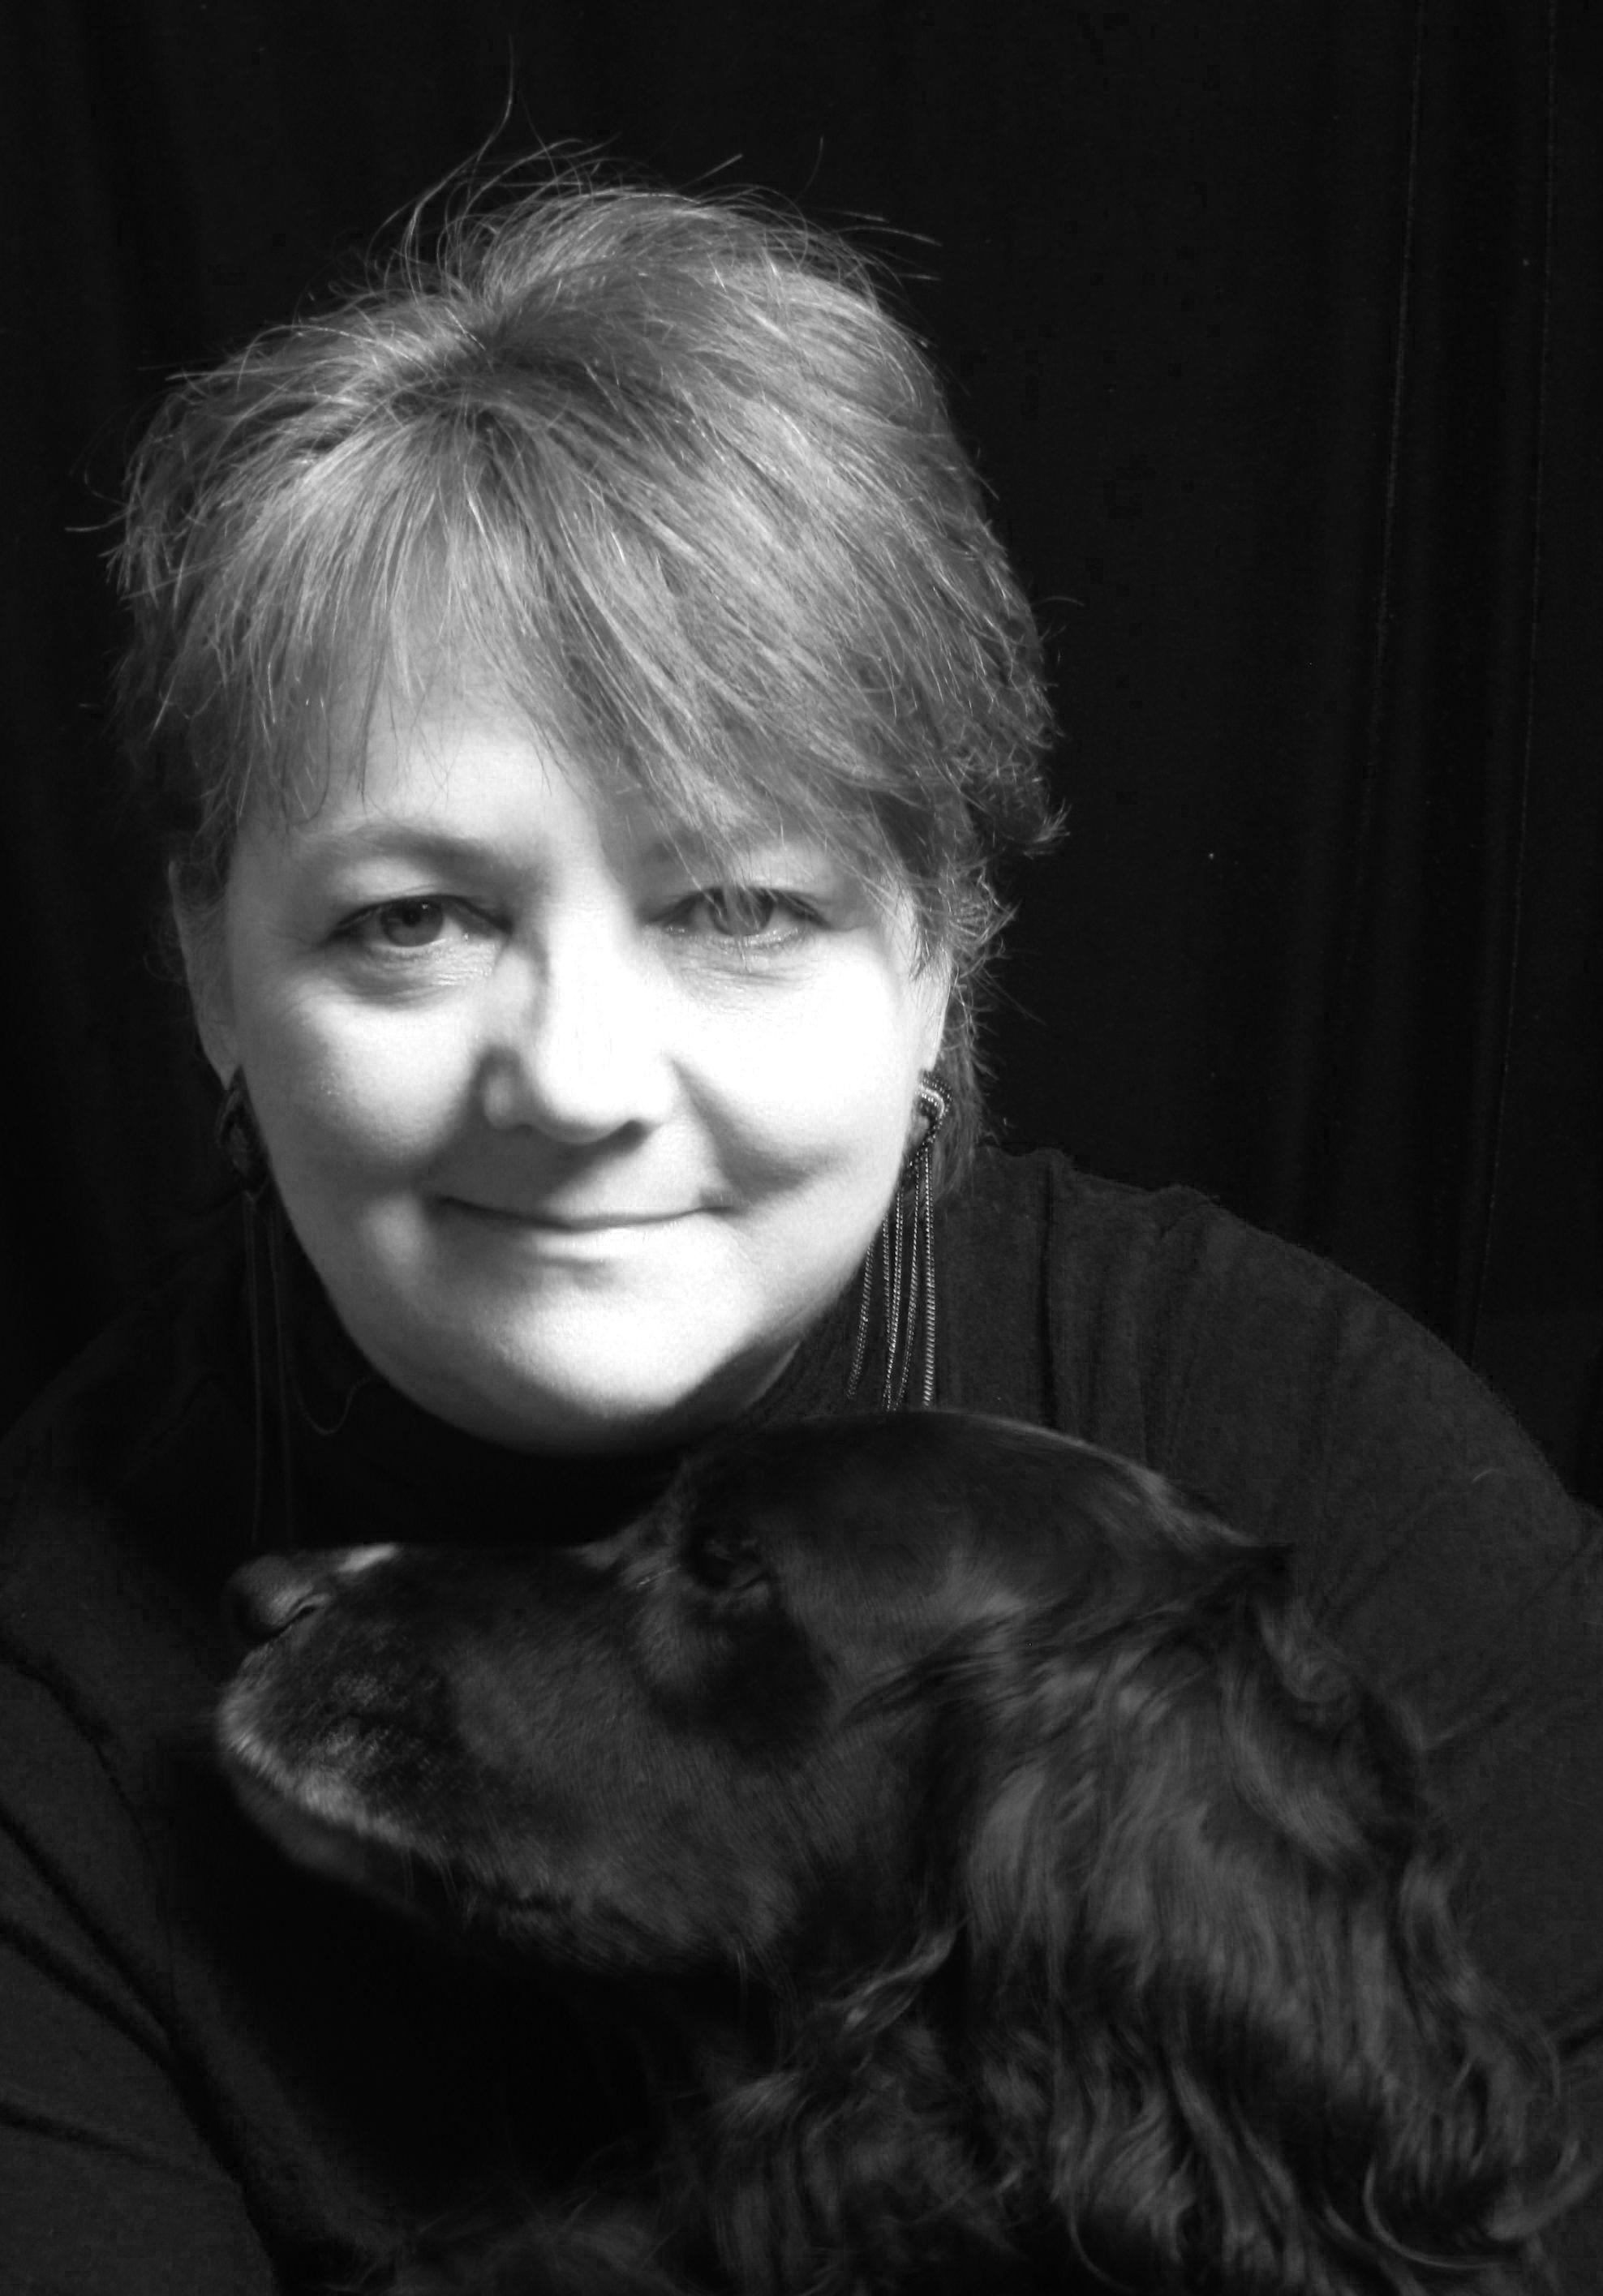 Brenda Brousseau - Saint Paul Art Crawl Director